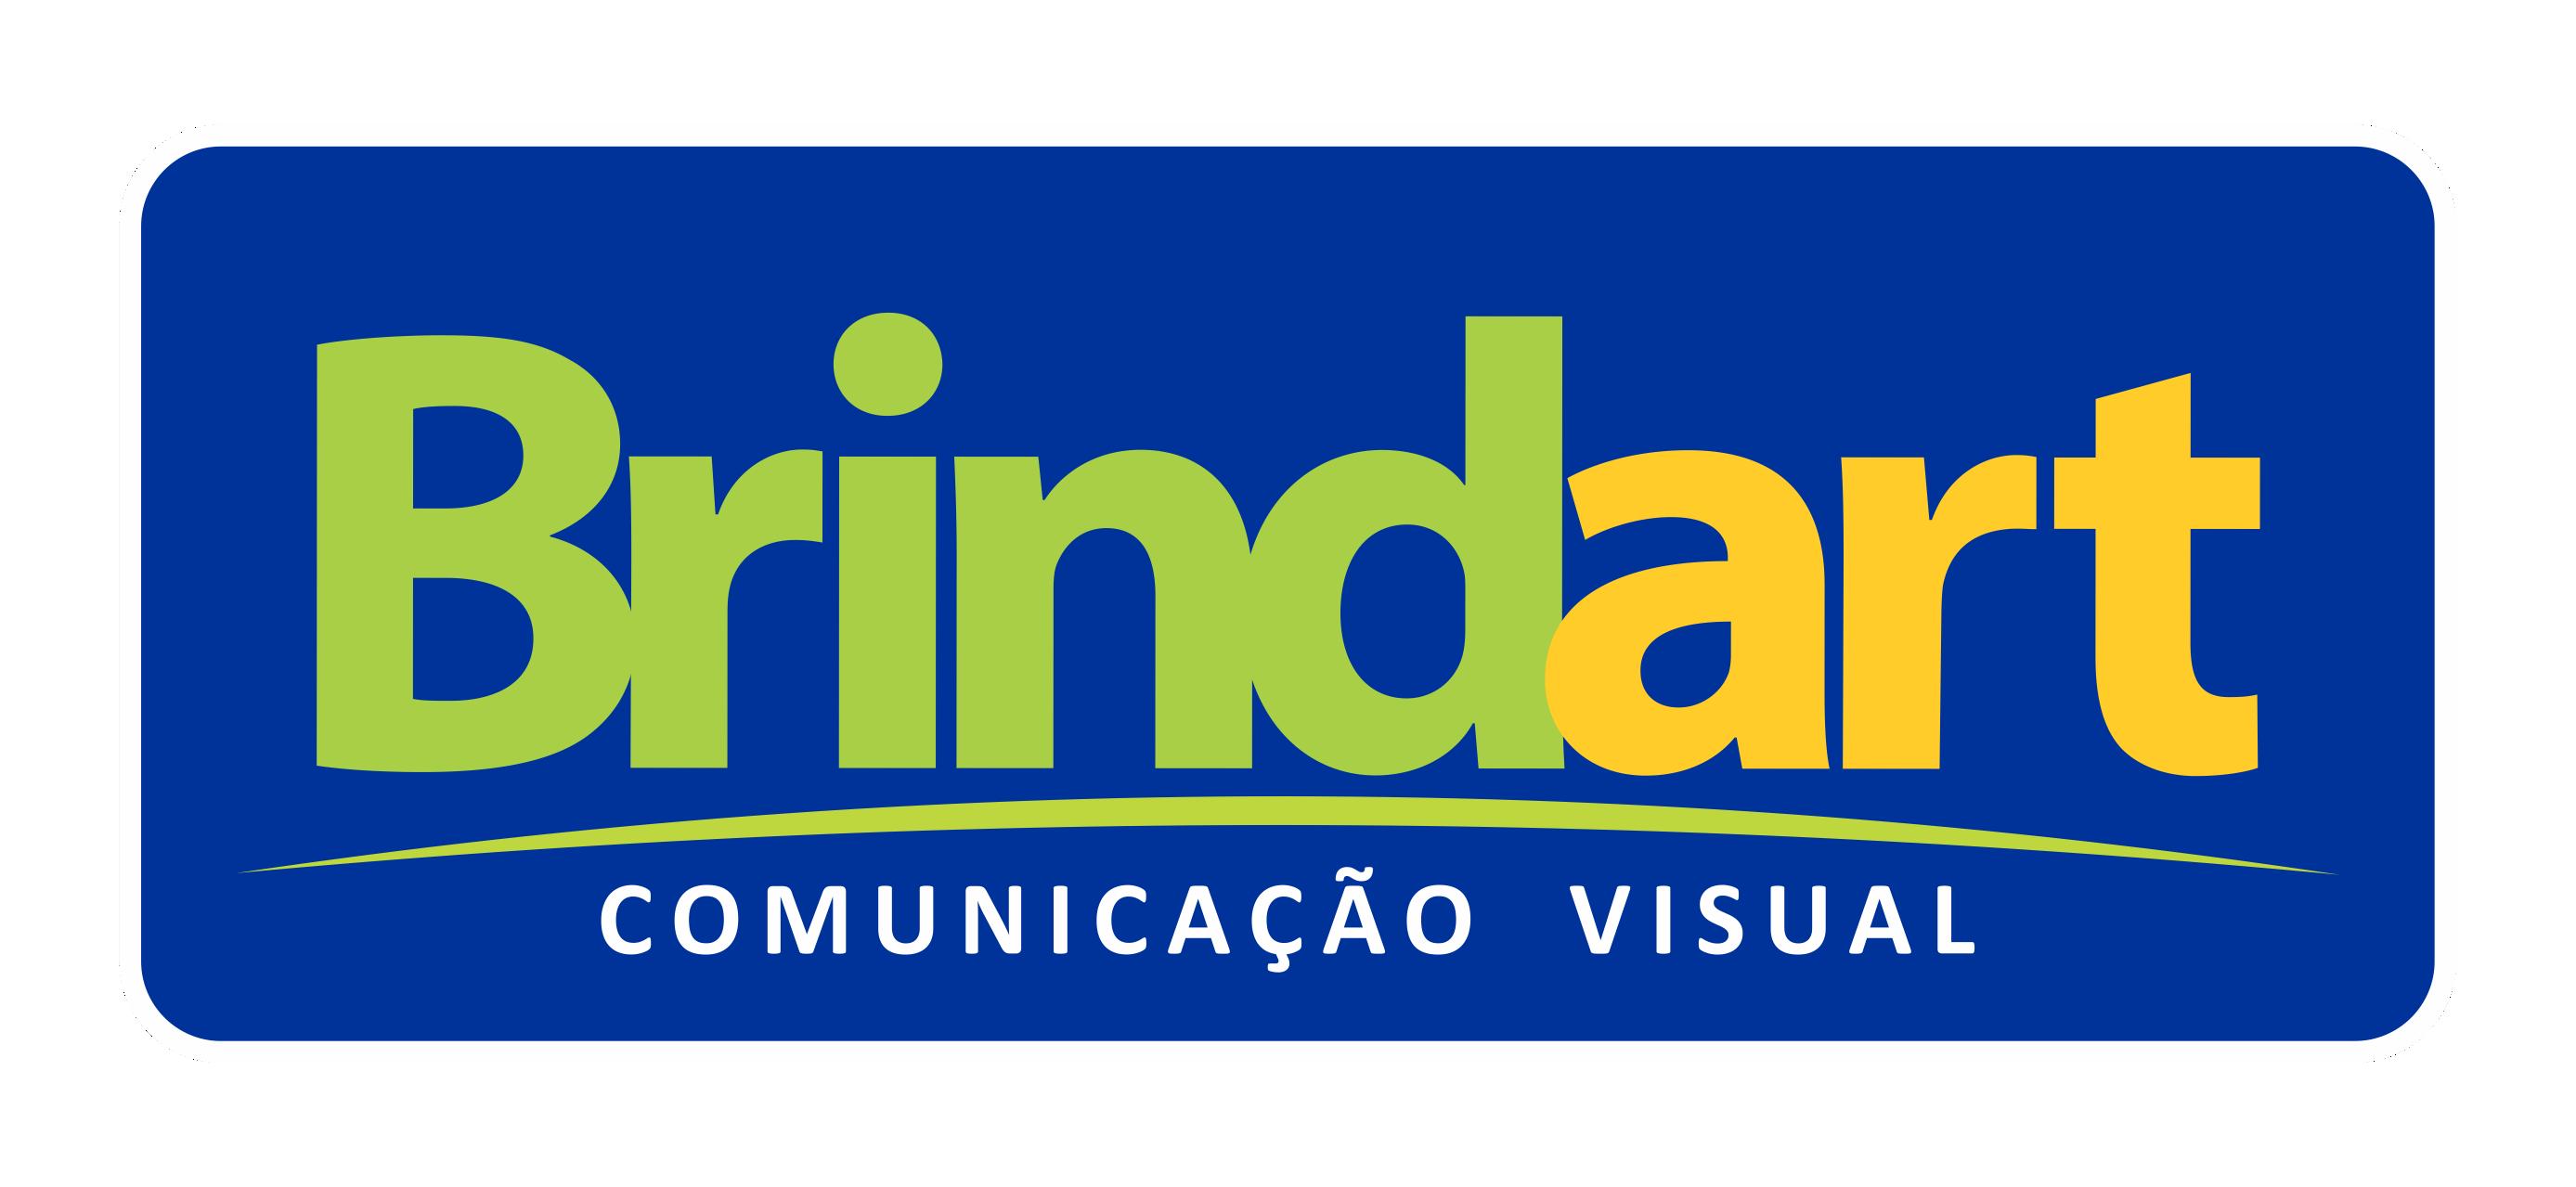 brindart logo